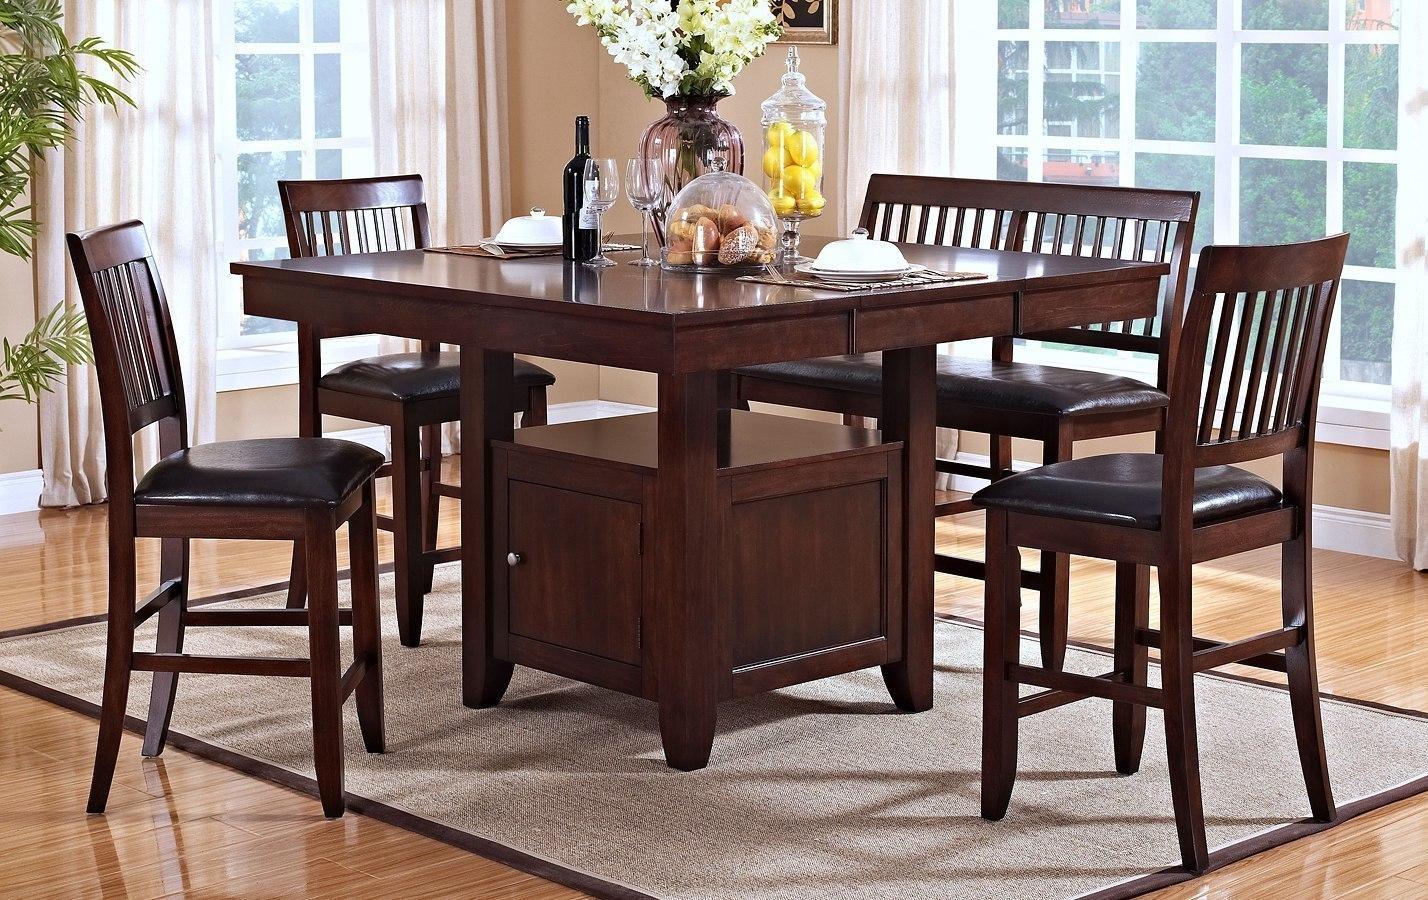 Kaylee Counter Height Dining Room Set (Tudor Brown)